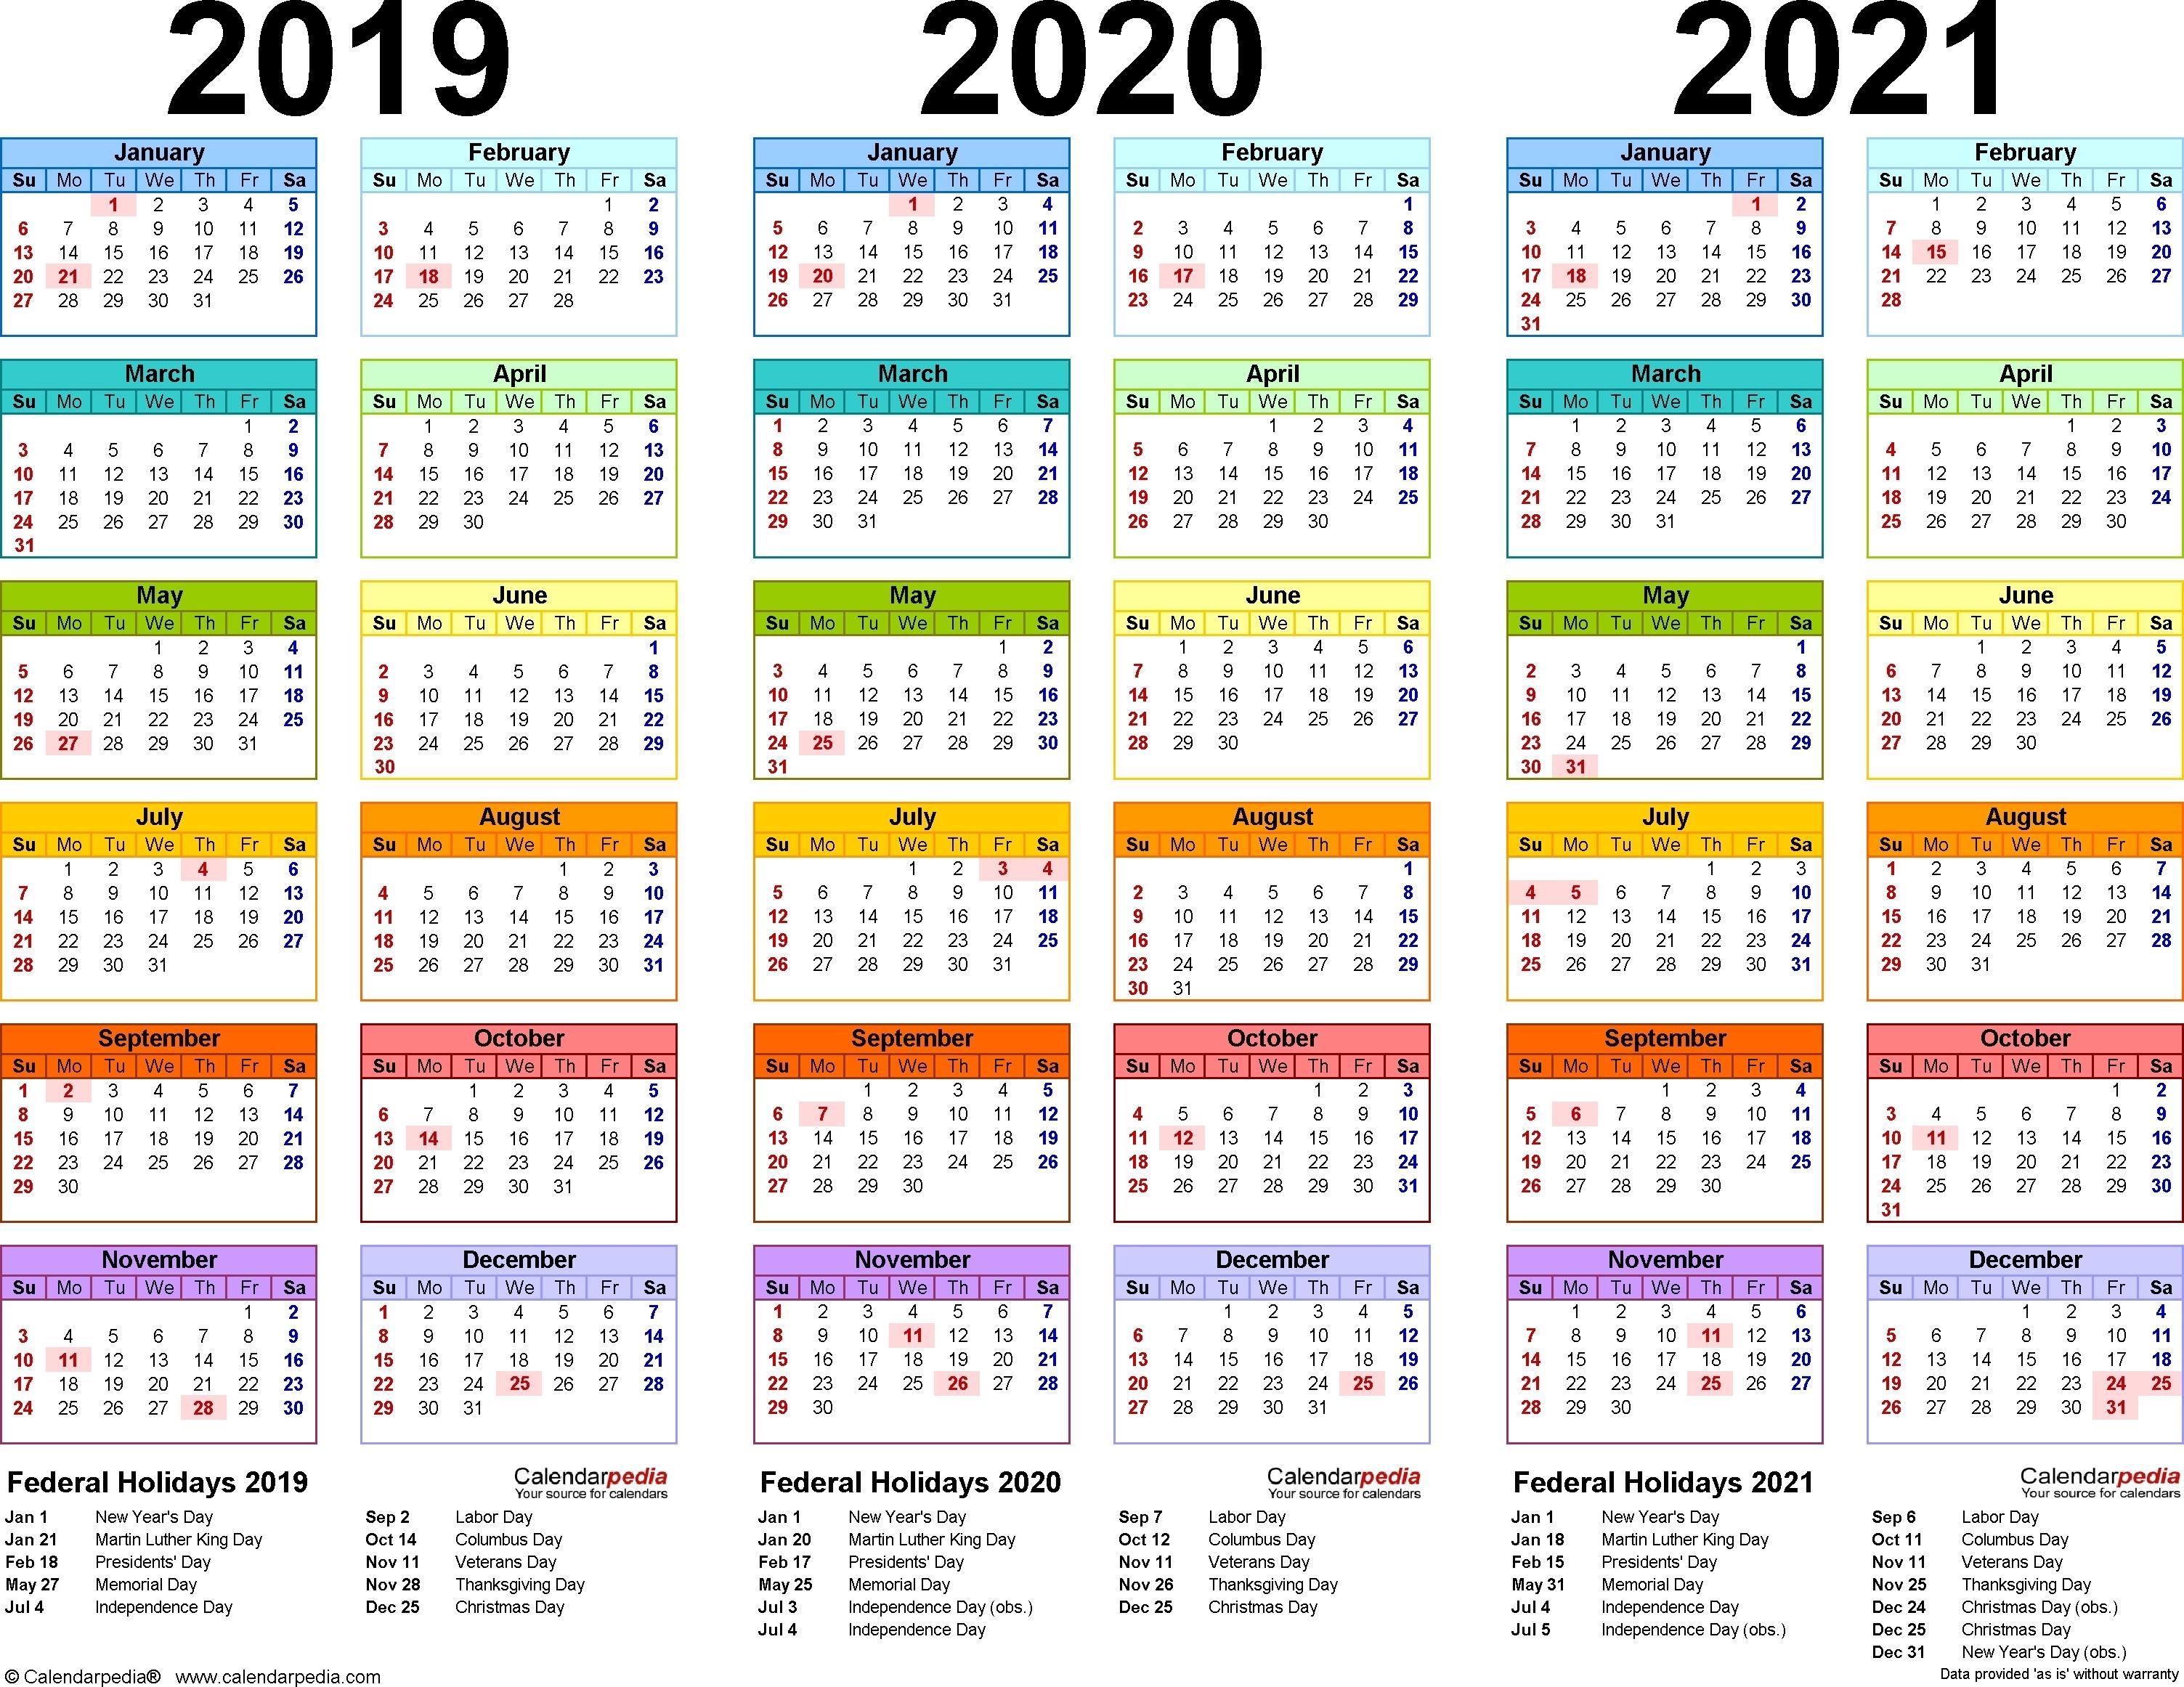 Calendar School Holiday 2020 Malaysia | Calendar Design Ideas-School Holidays 2020 Malaysia